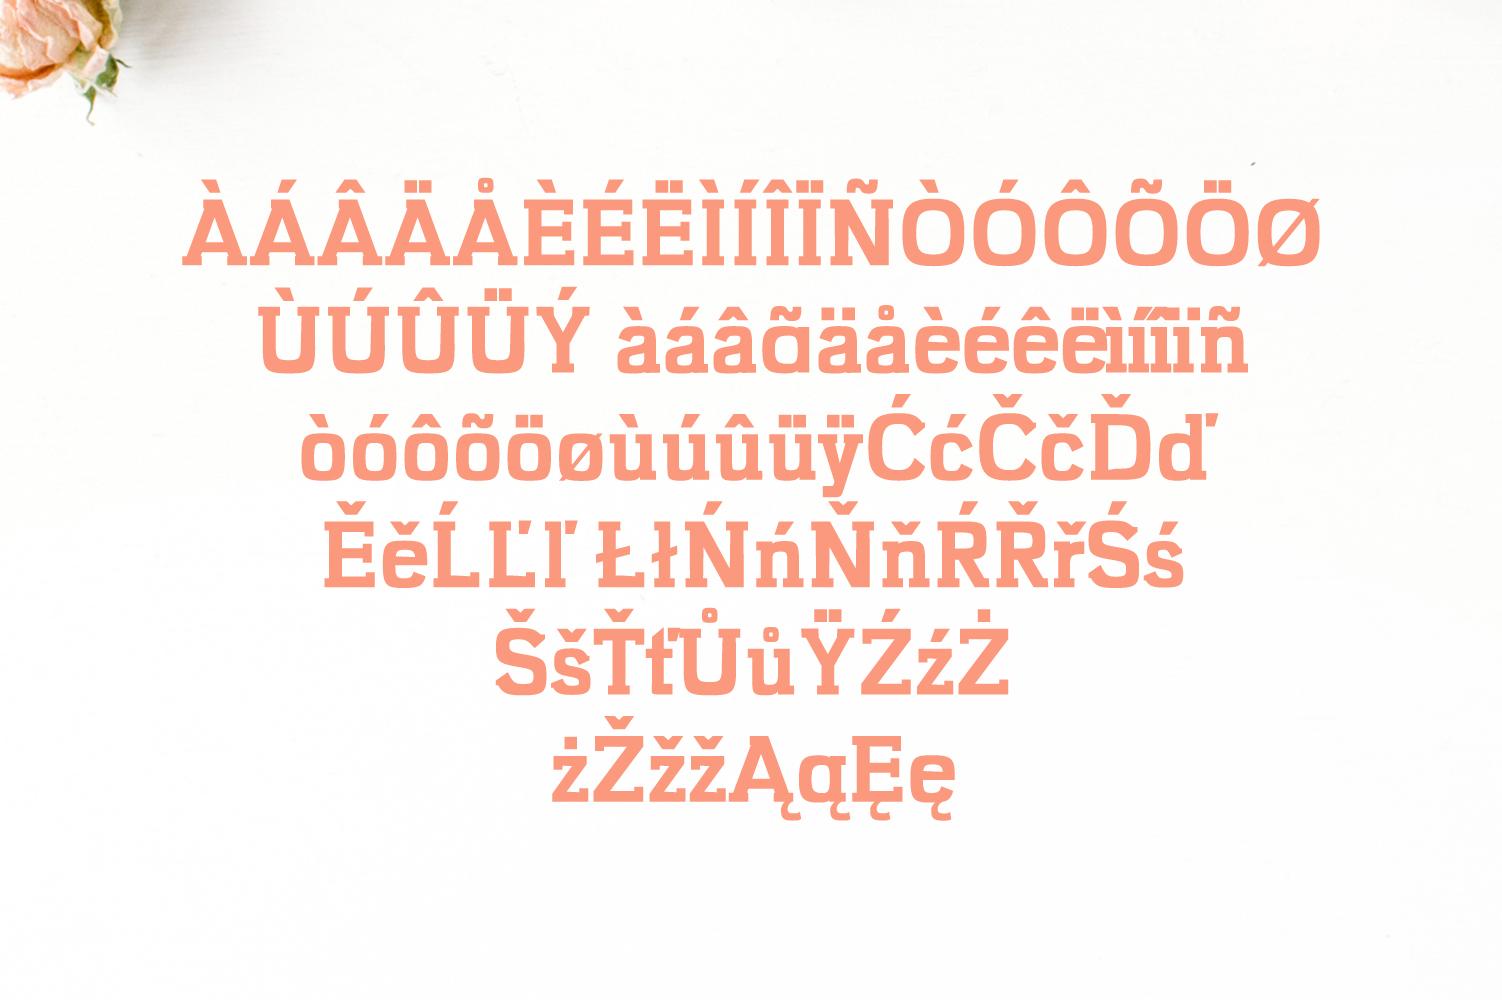 Kaayla Slab Serif 4 Font Pack example image 5